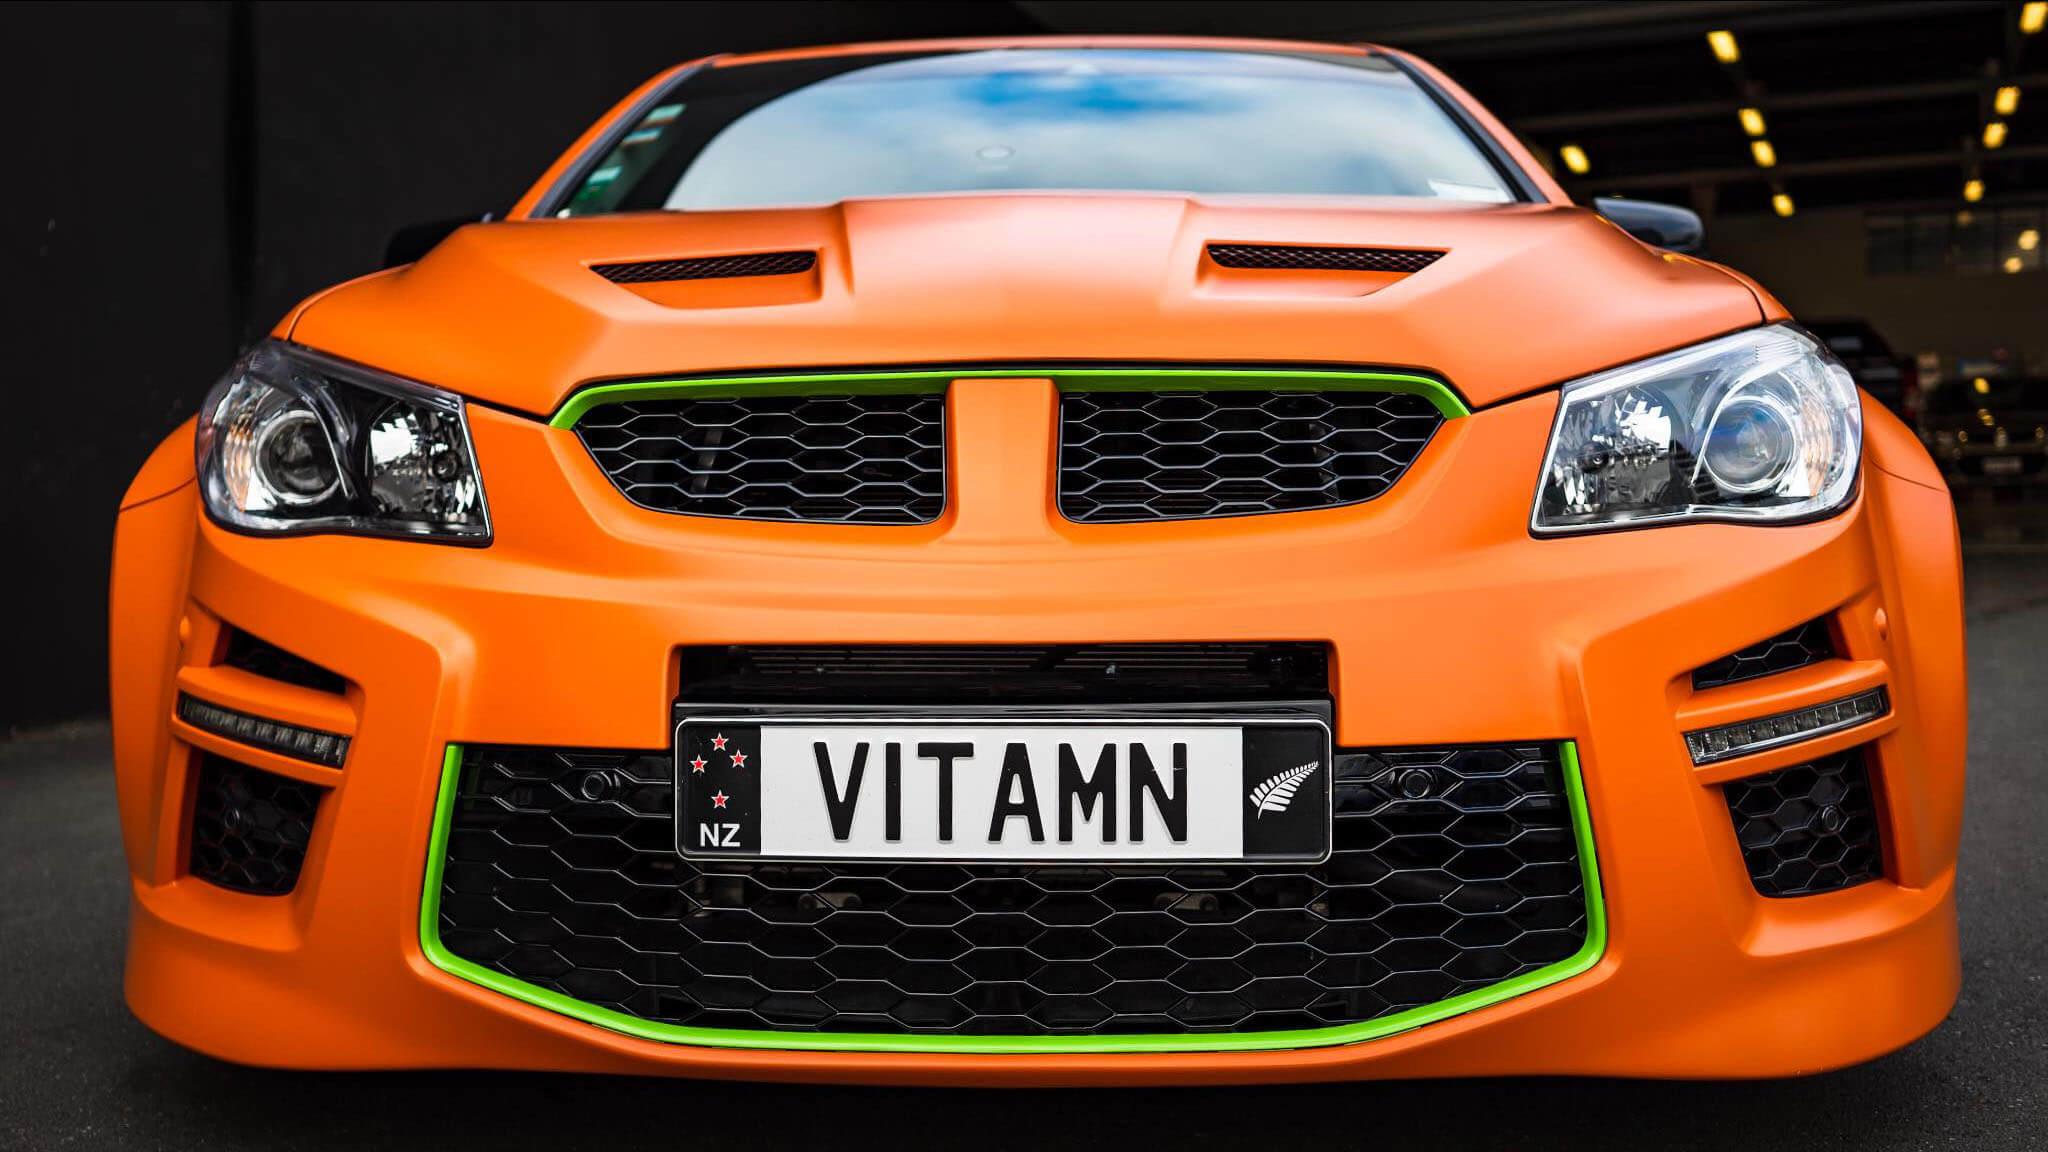 2014 Holden HSV VITAMN - Back View